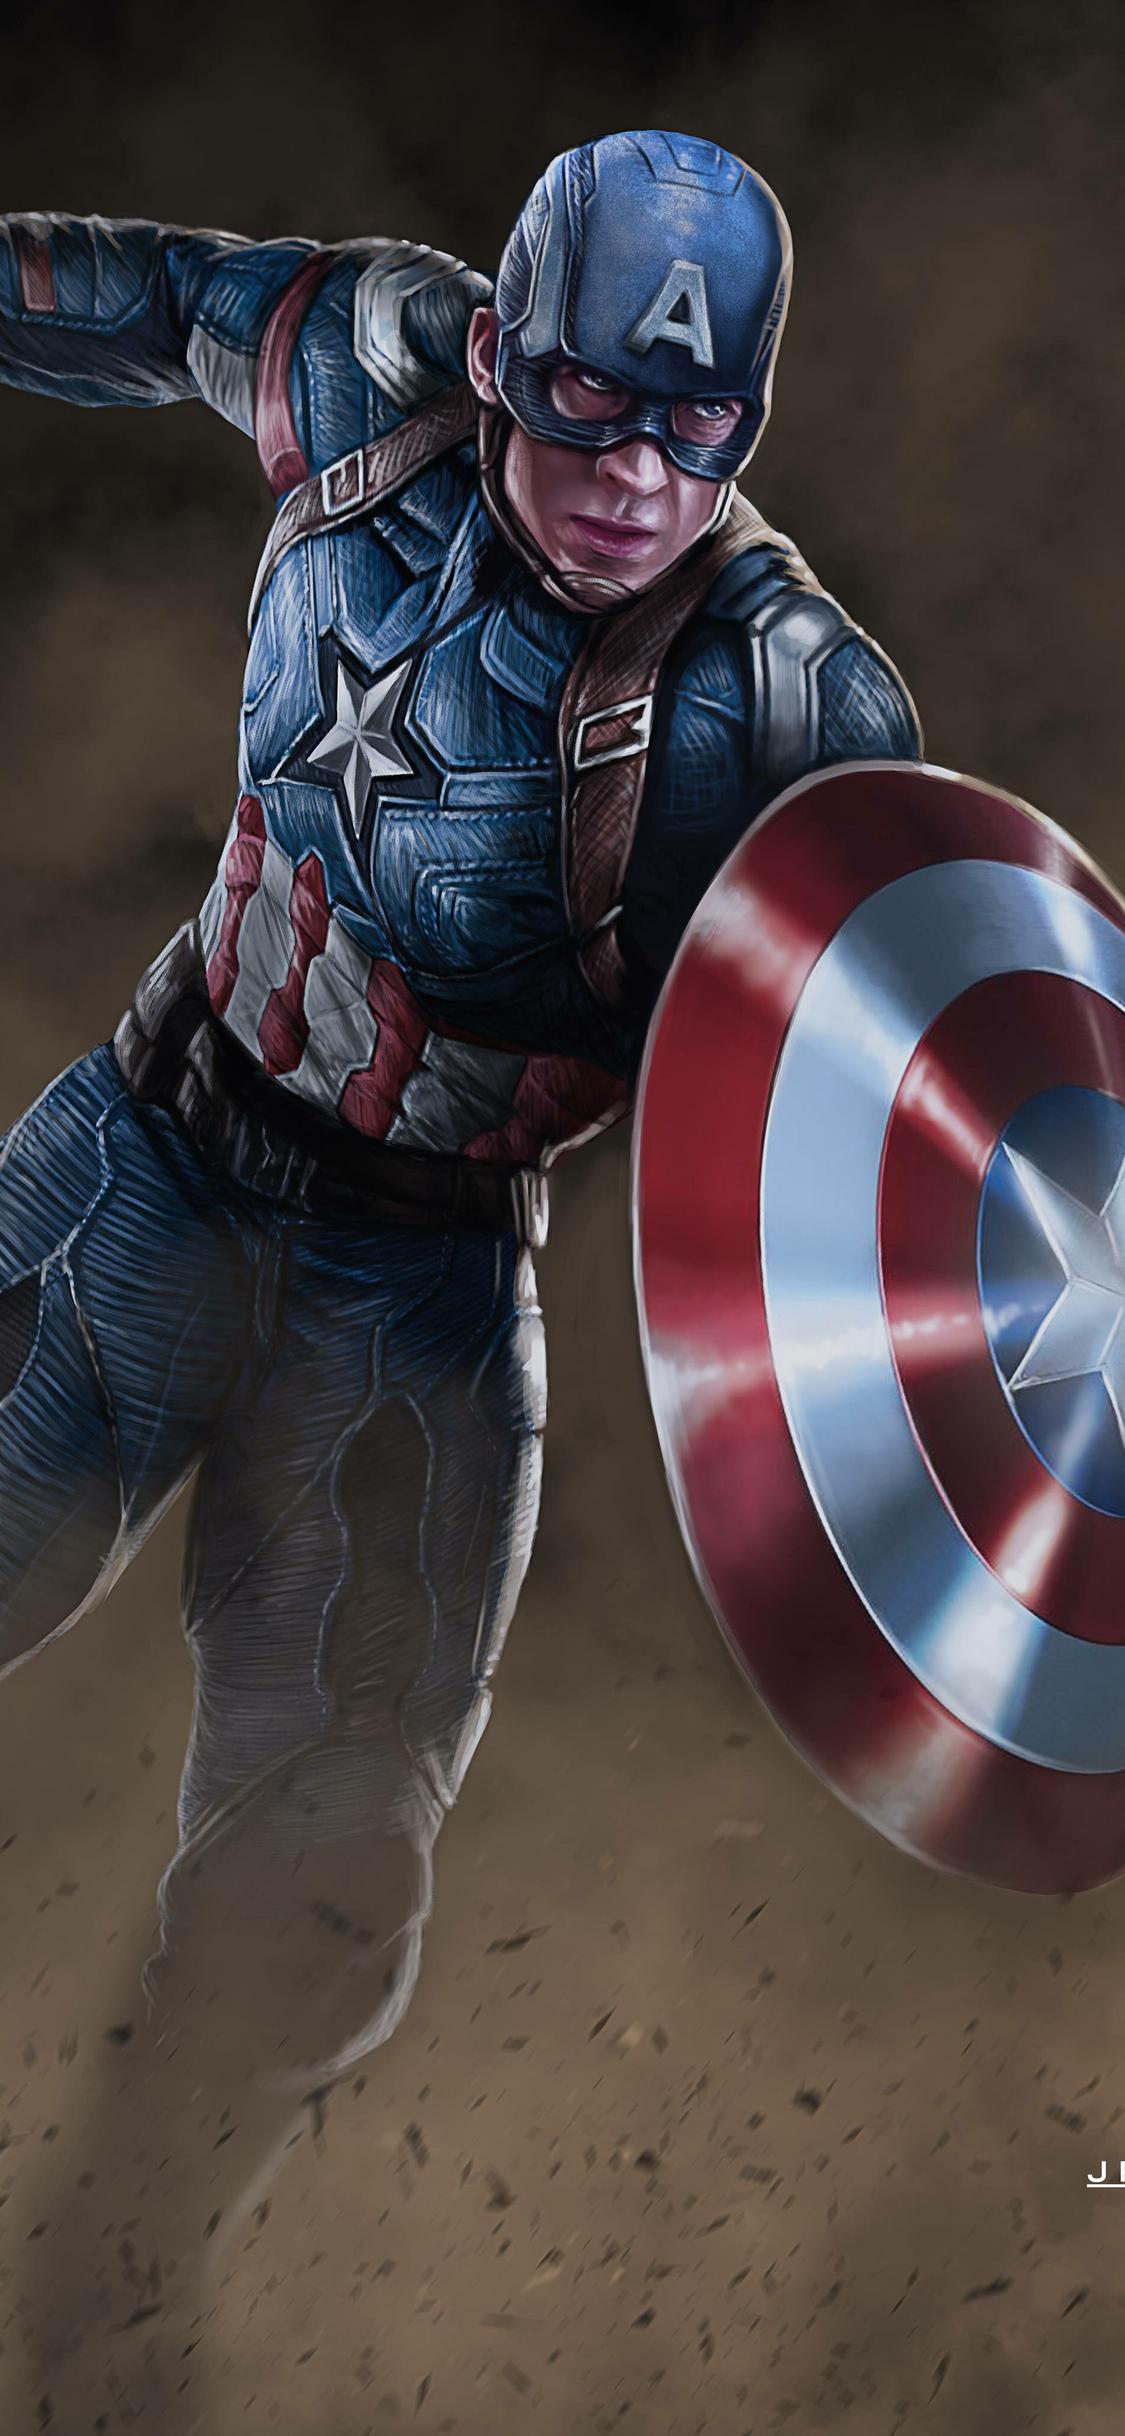 1125x2436 Arts Captain America New Iphone Xsiphone 10iphone X Hd